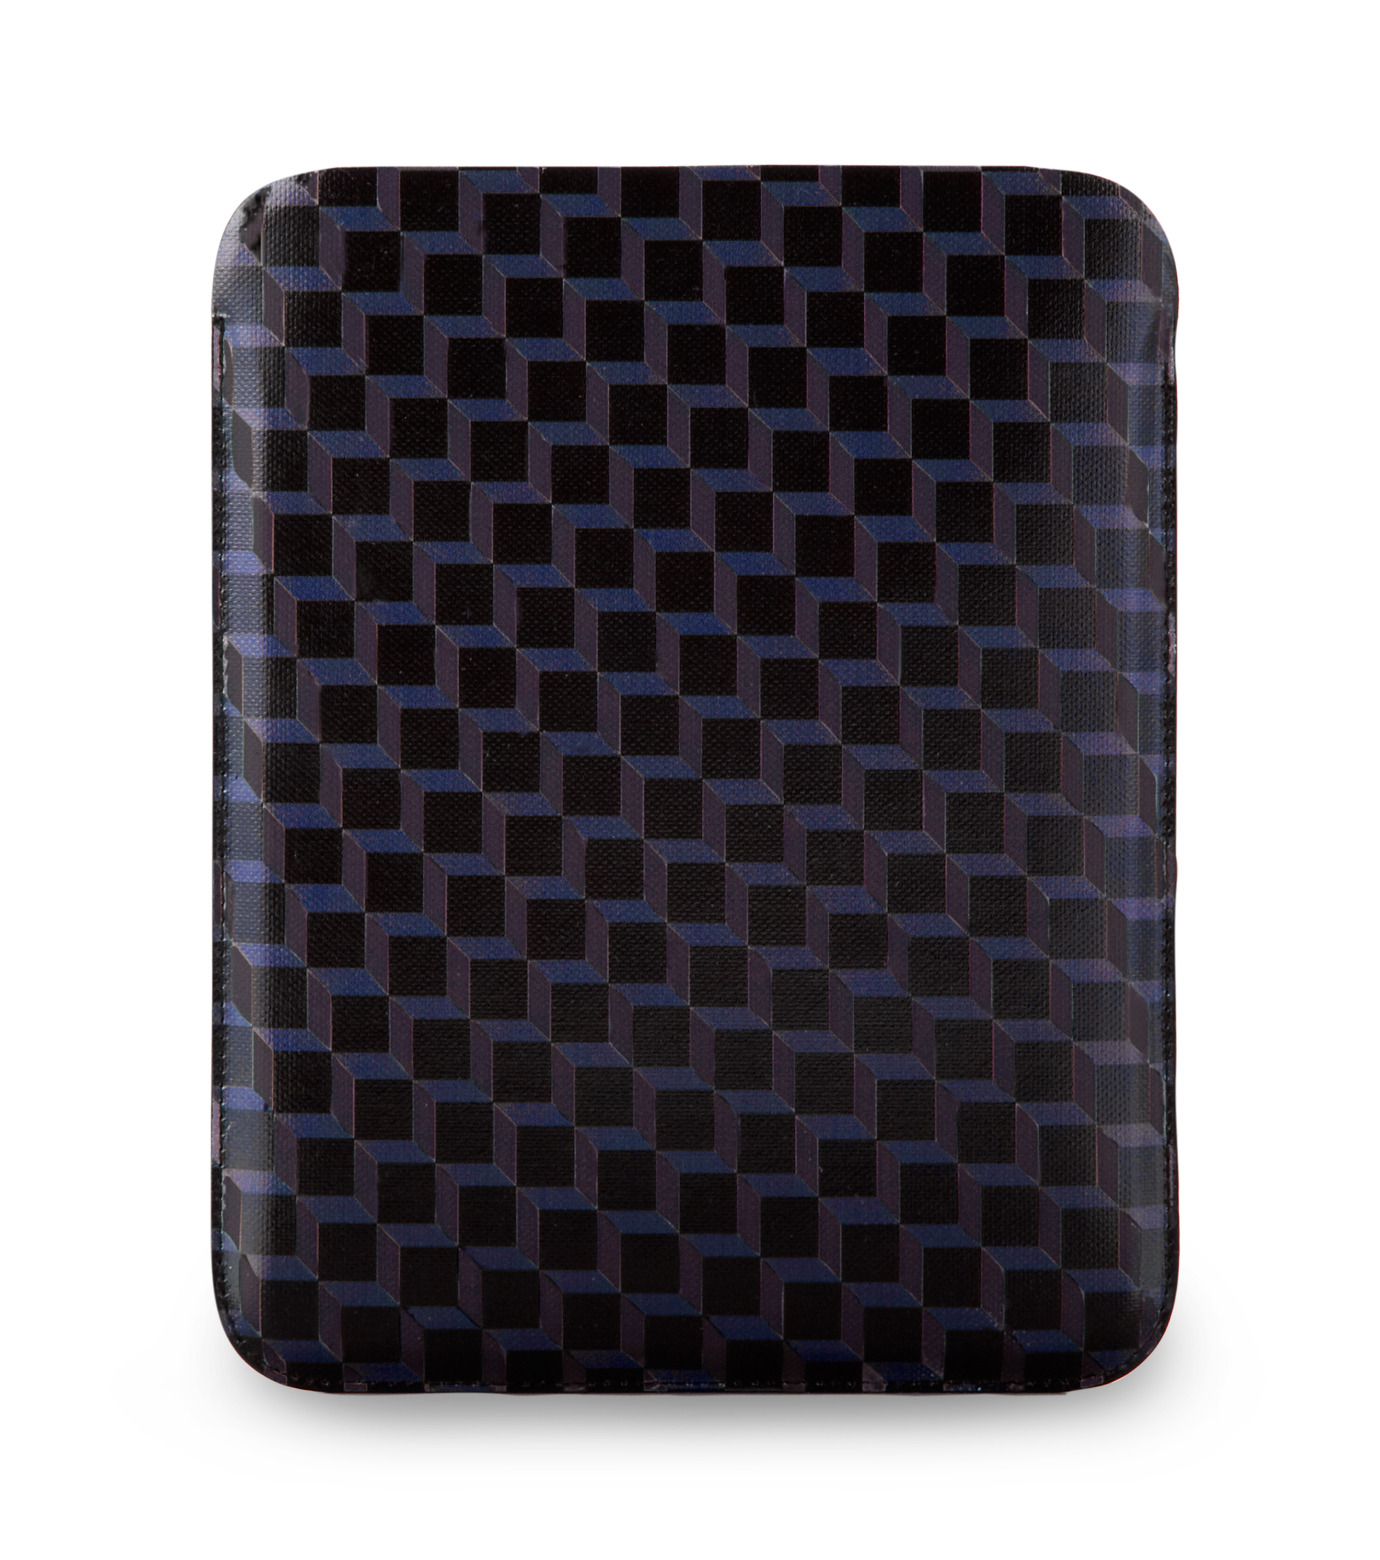 Pierre Hardy(ピエール アルディ)のI-pad case-BROWN-A1IPAD-42 拡大詳細画像1